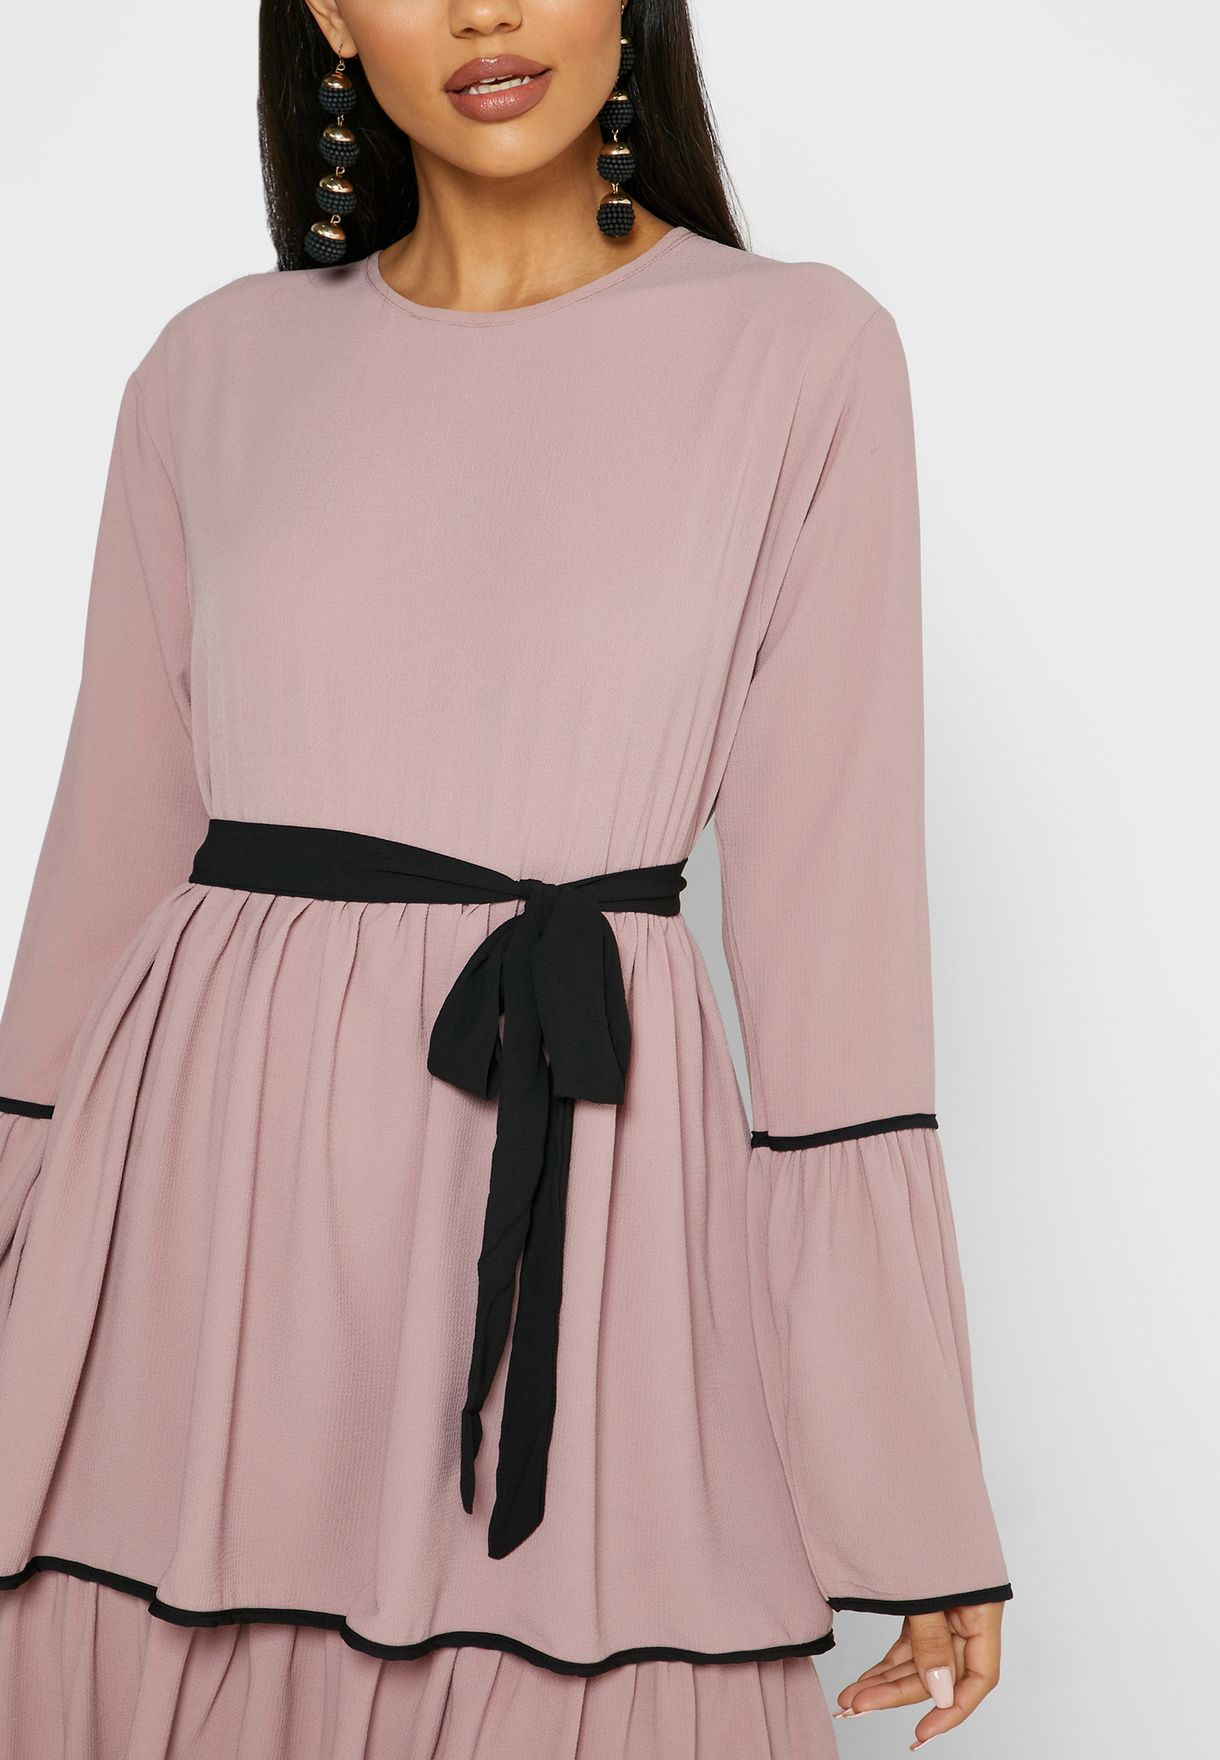 فستان ماكسي مزين بطبقات